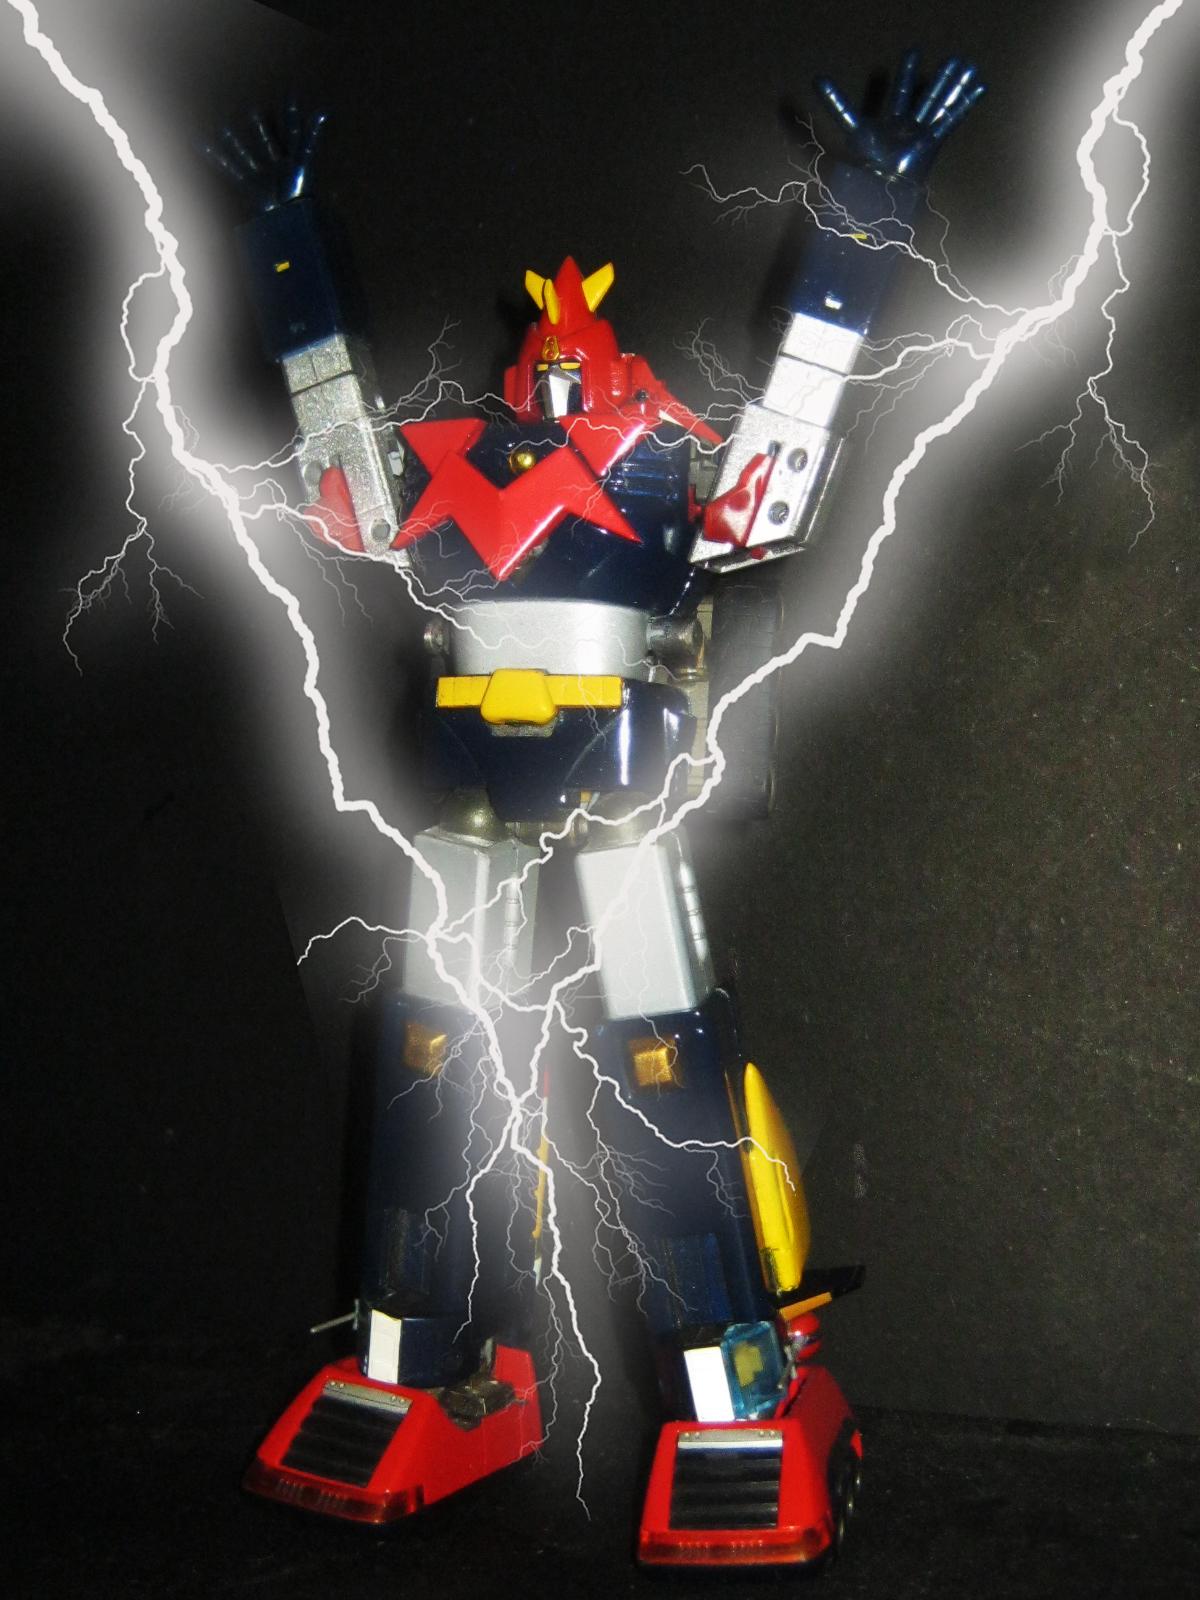 Voltes V Super Charged Robots Photo 37541527 Fanpop